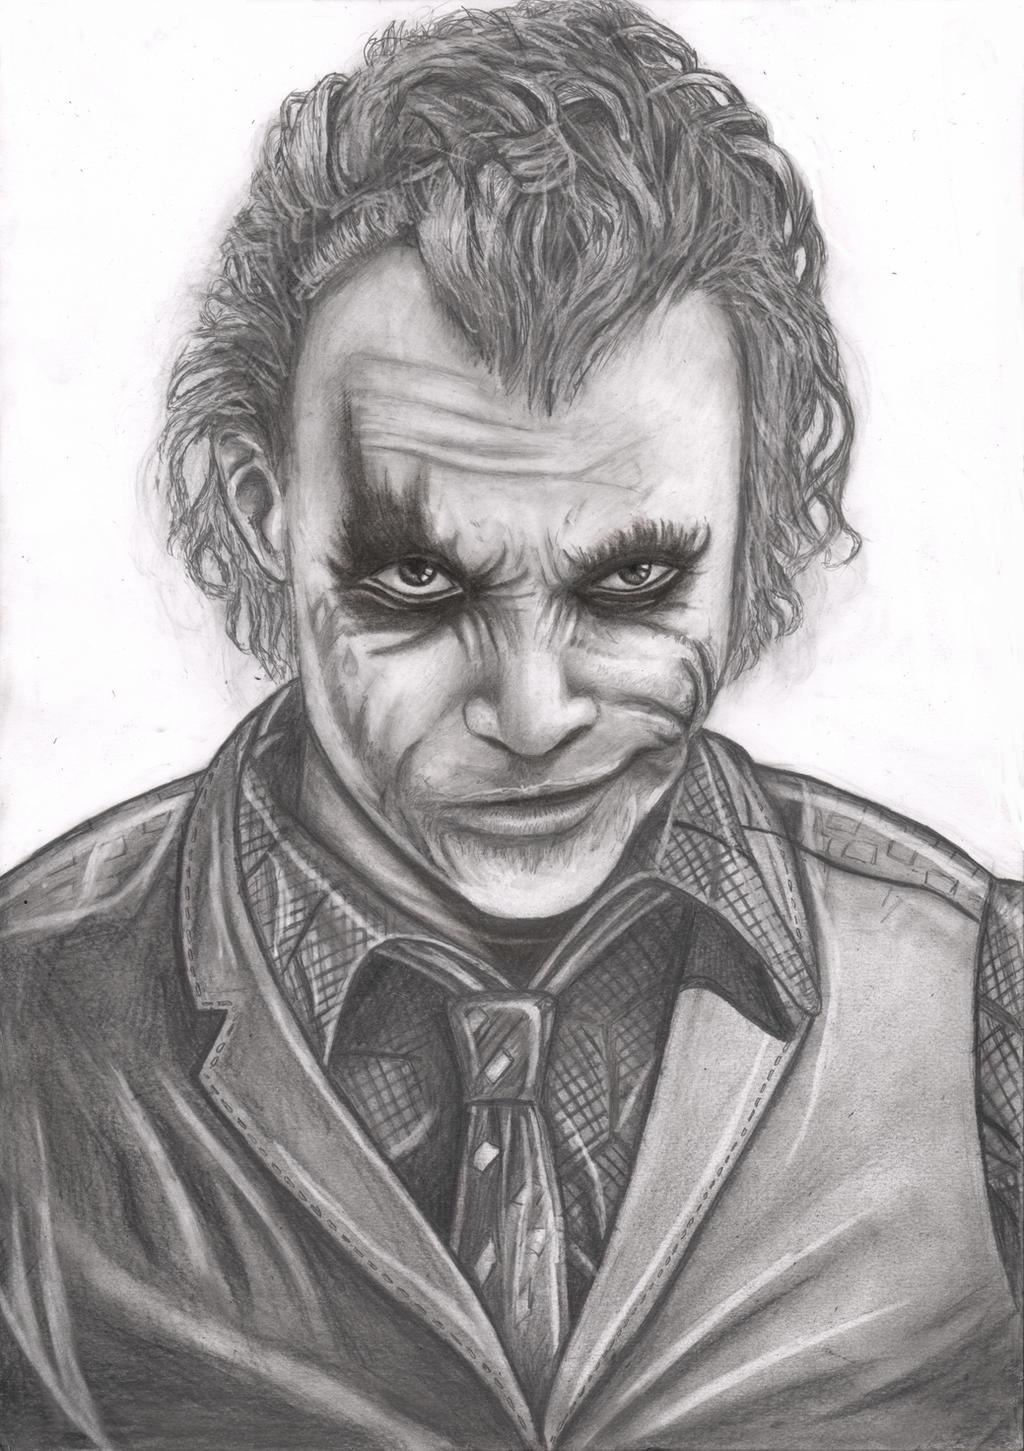 Joker Scribble Drawing : The joker st attempt by pen tacular artist on deviantart